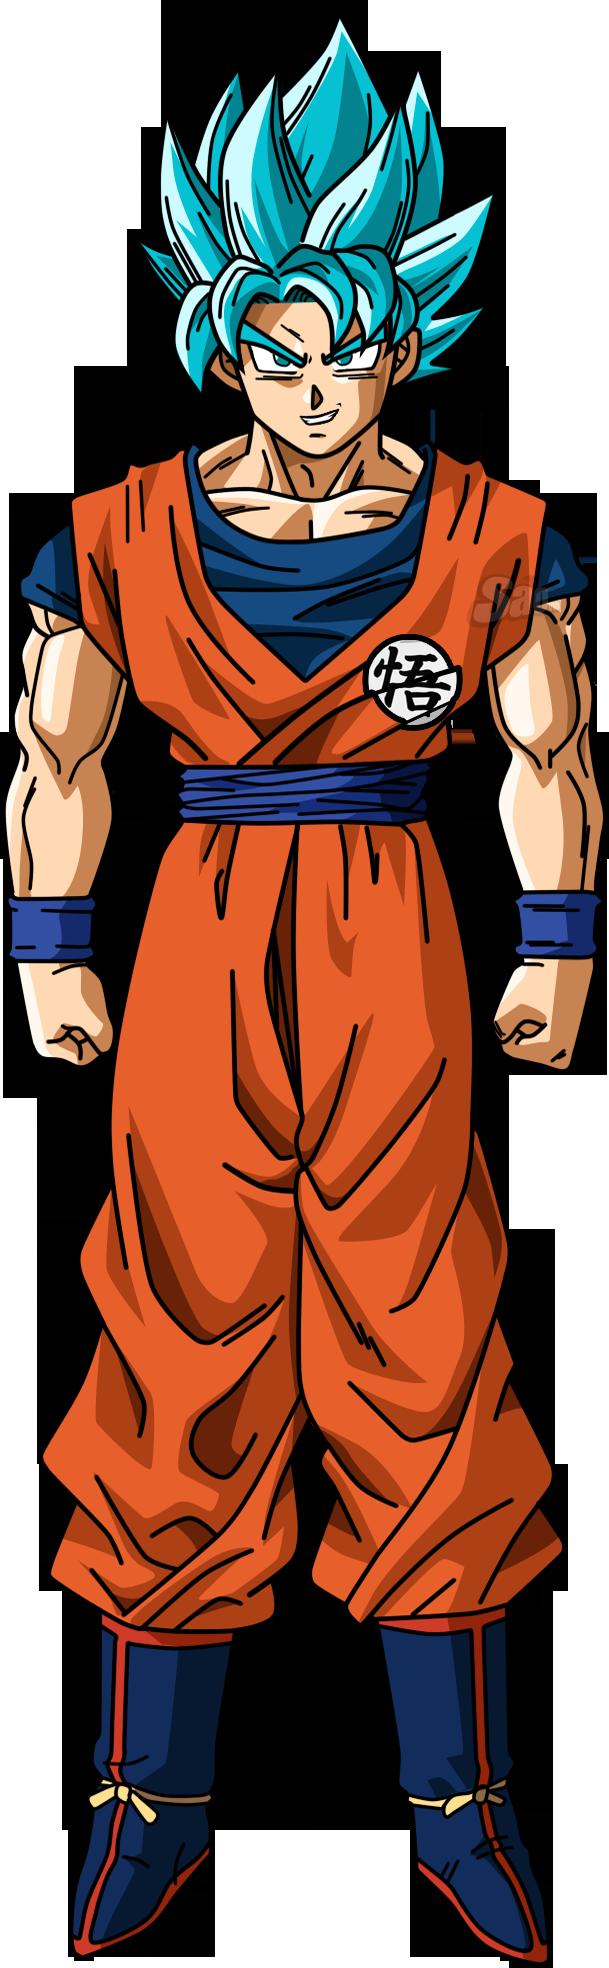 Goku Ssj Blue By Saodvd Songoku Related Keywords Long Tail